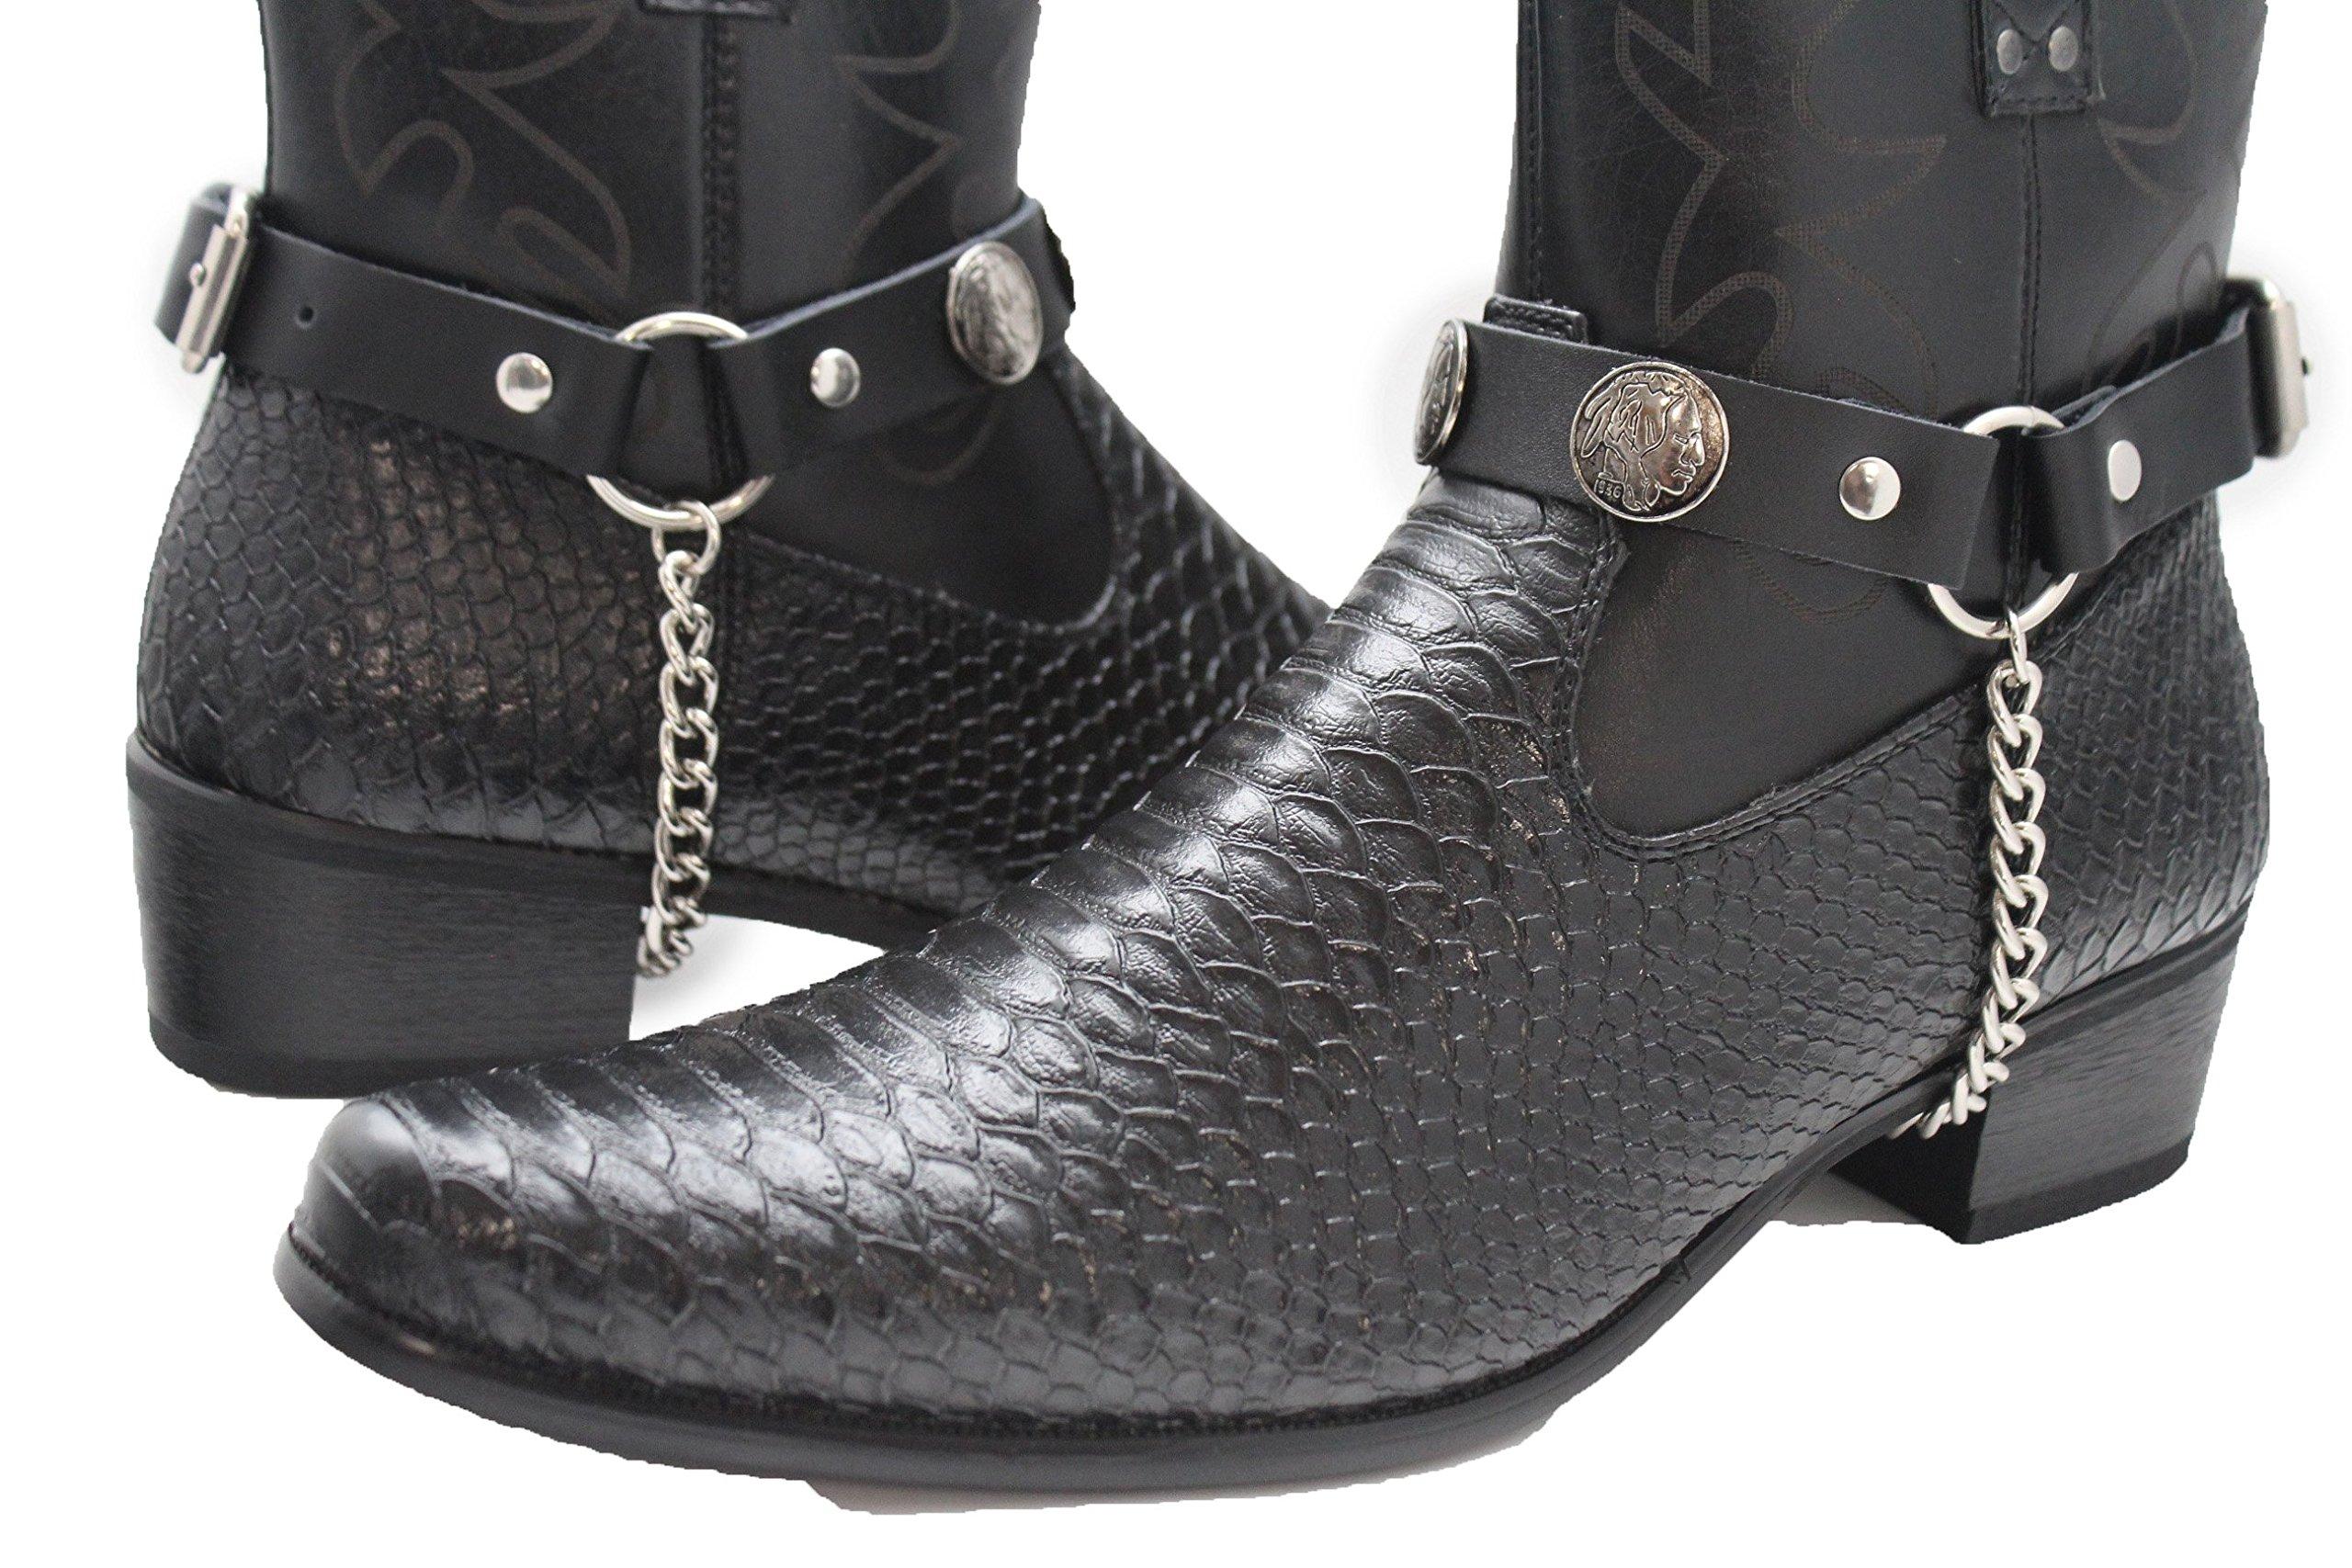 TFJ Men Biker Boot Bracelets Black Leather Straps Silver Chains Native Amrican Indian